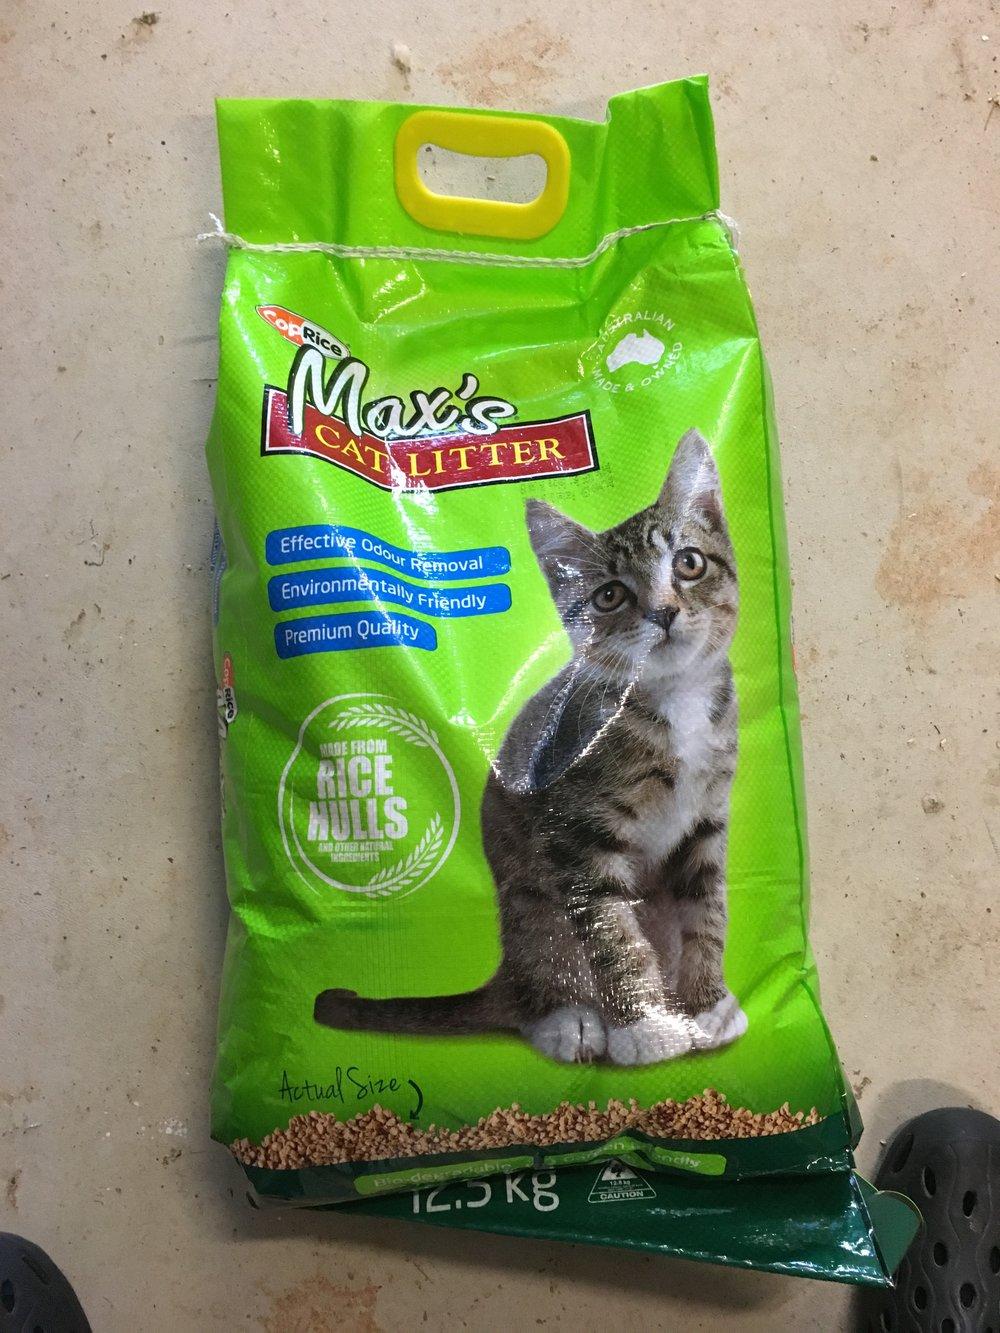 Max's cat litter